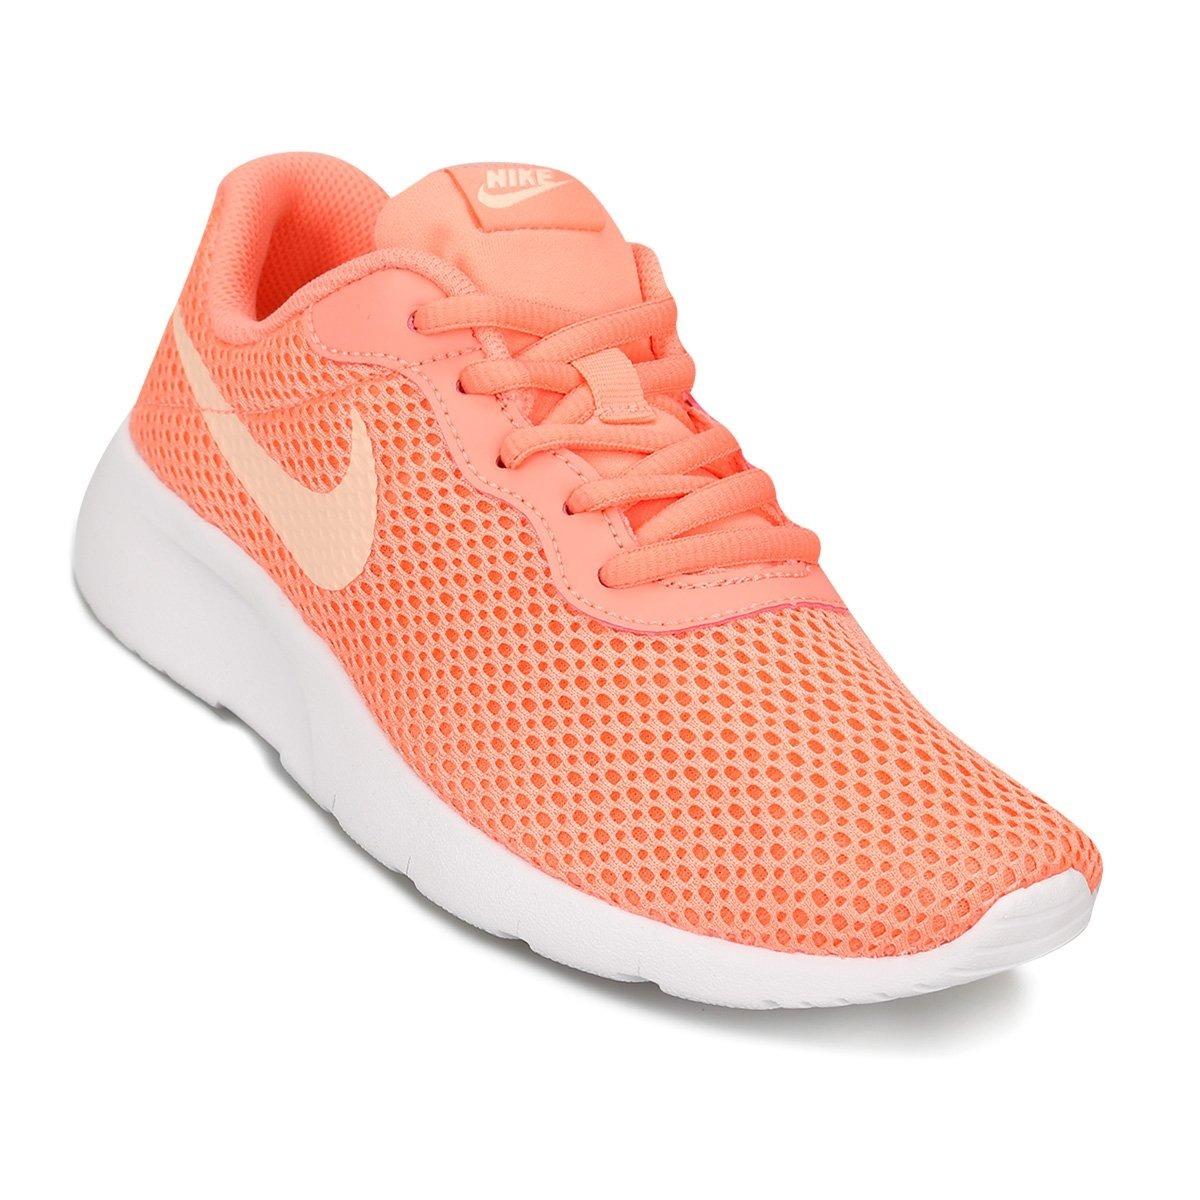 5eed26773 zapatillas nike niñas - tanjun gs - super comodas - naranja. Cargando zoom.